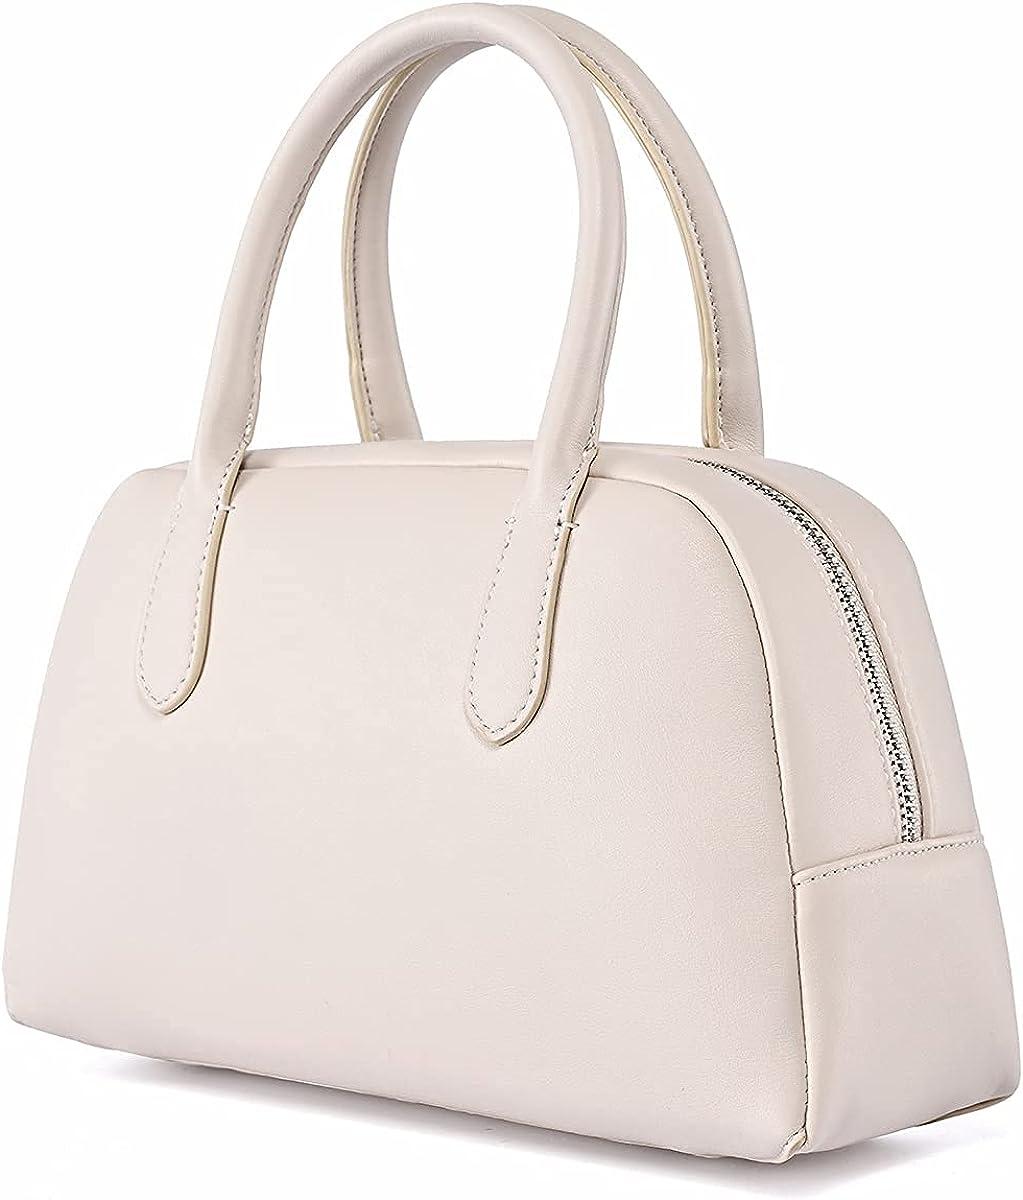 Small Handbags for Women Classic Zip Top Handle Hobo Satchel Bag Tote Shoulder Purse